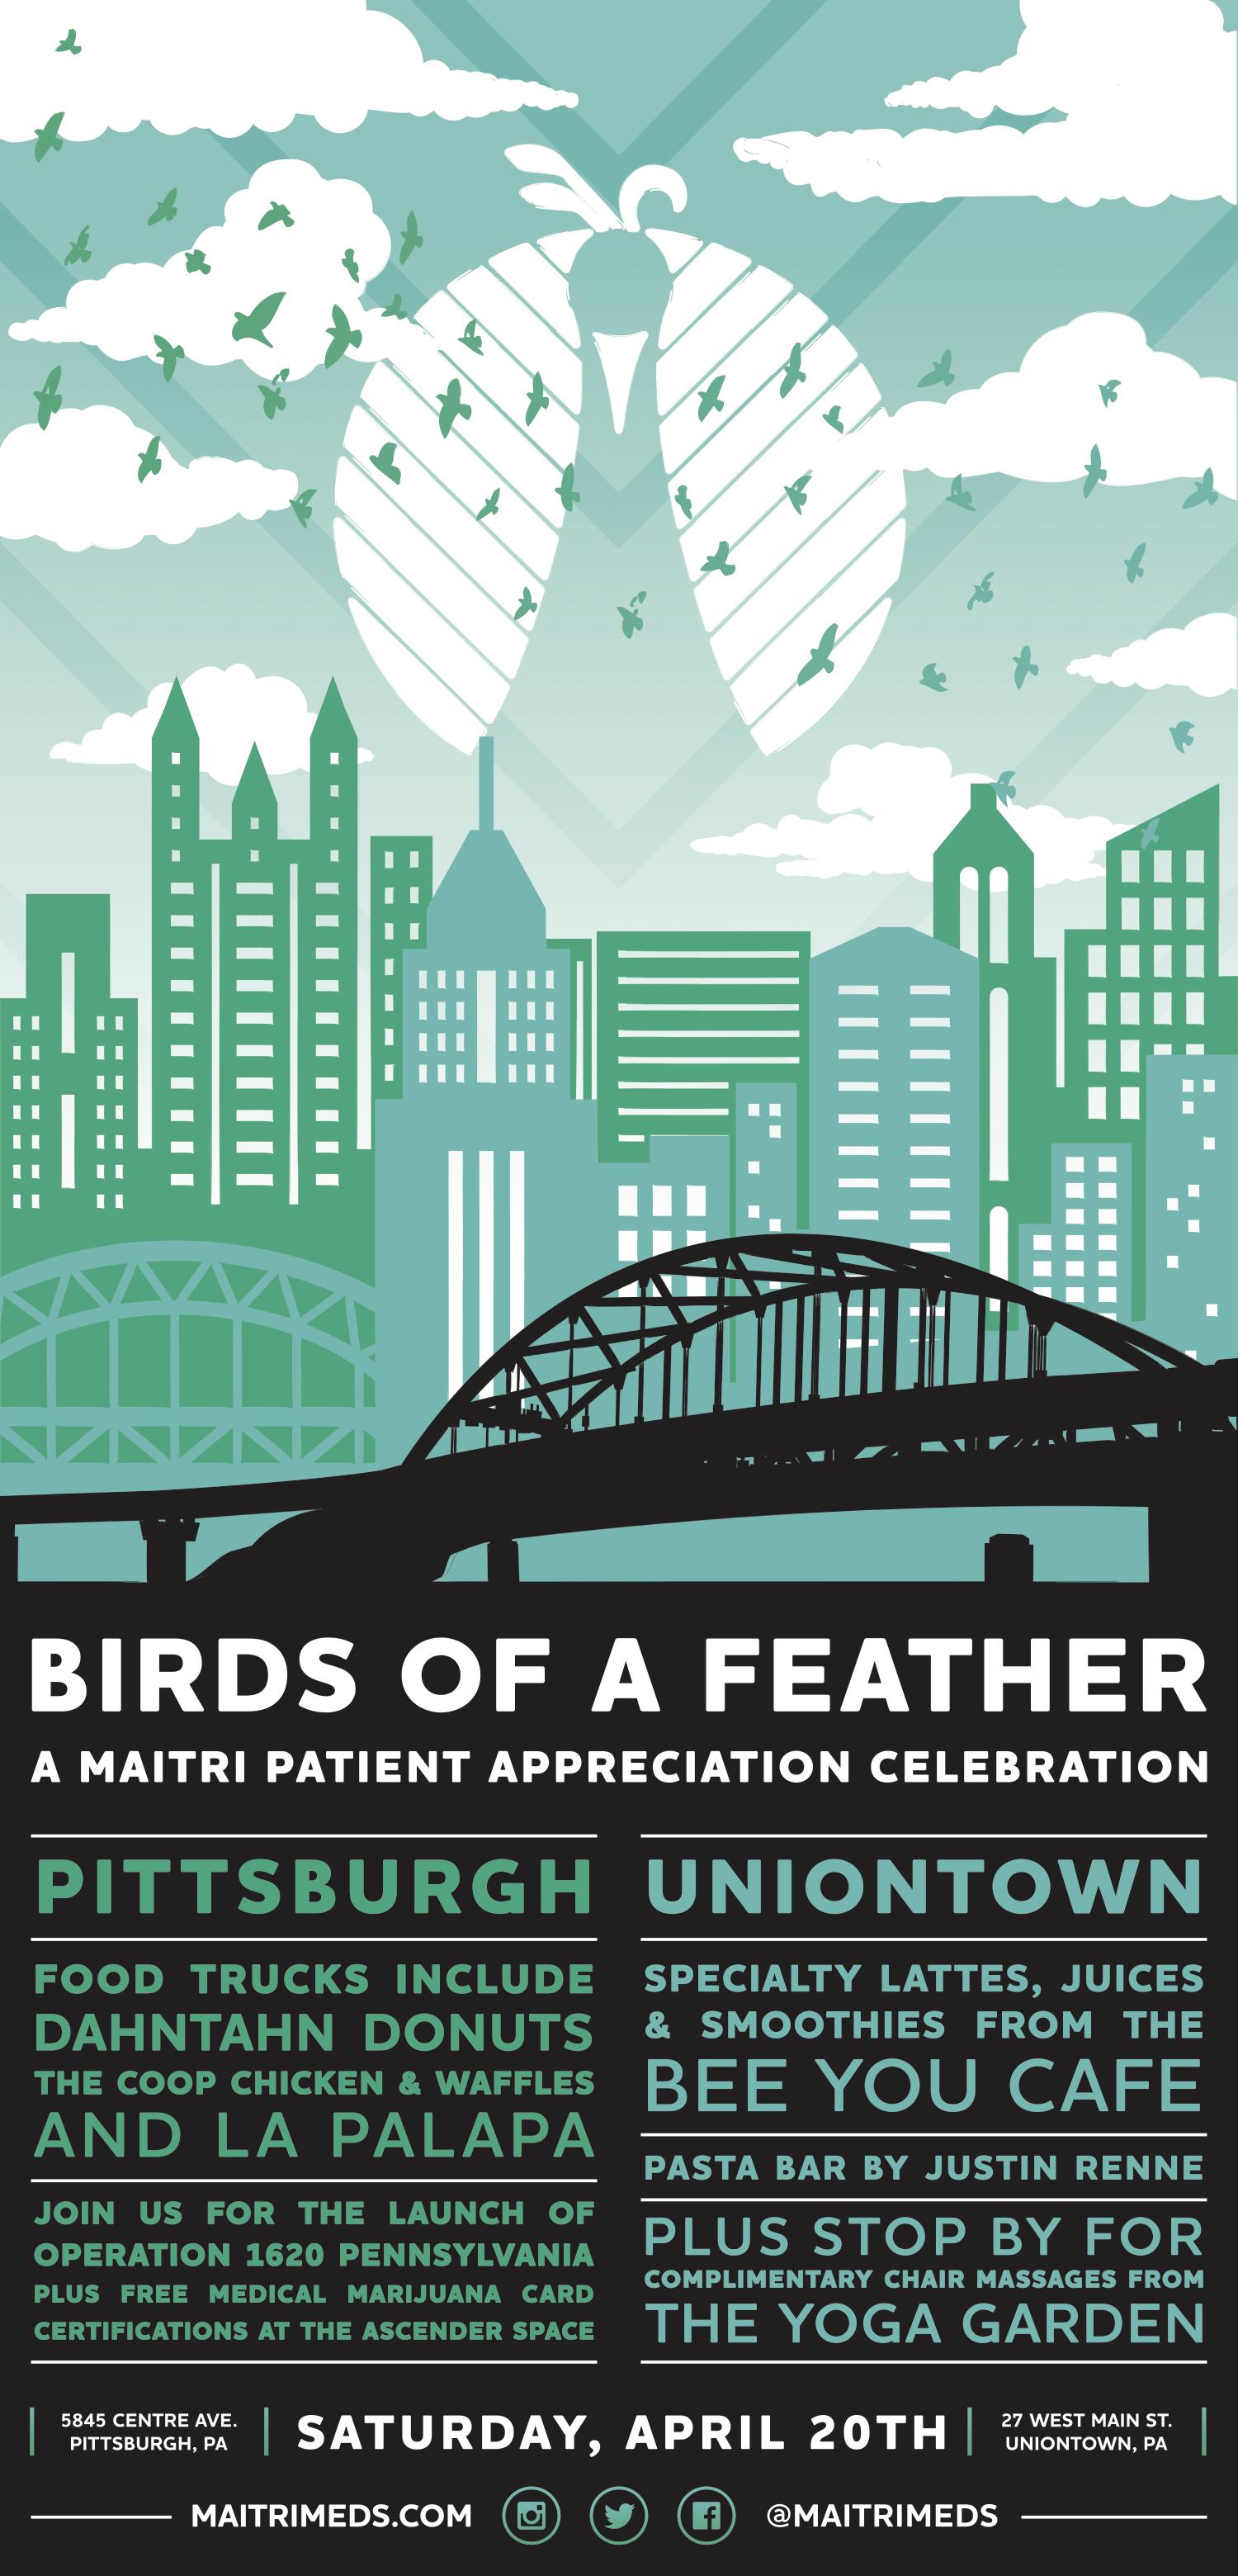 Birds of a Feather: A Maitri Patient Appreciation